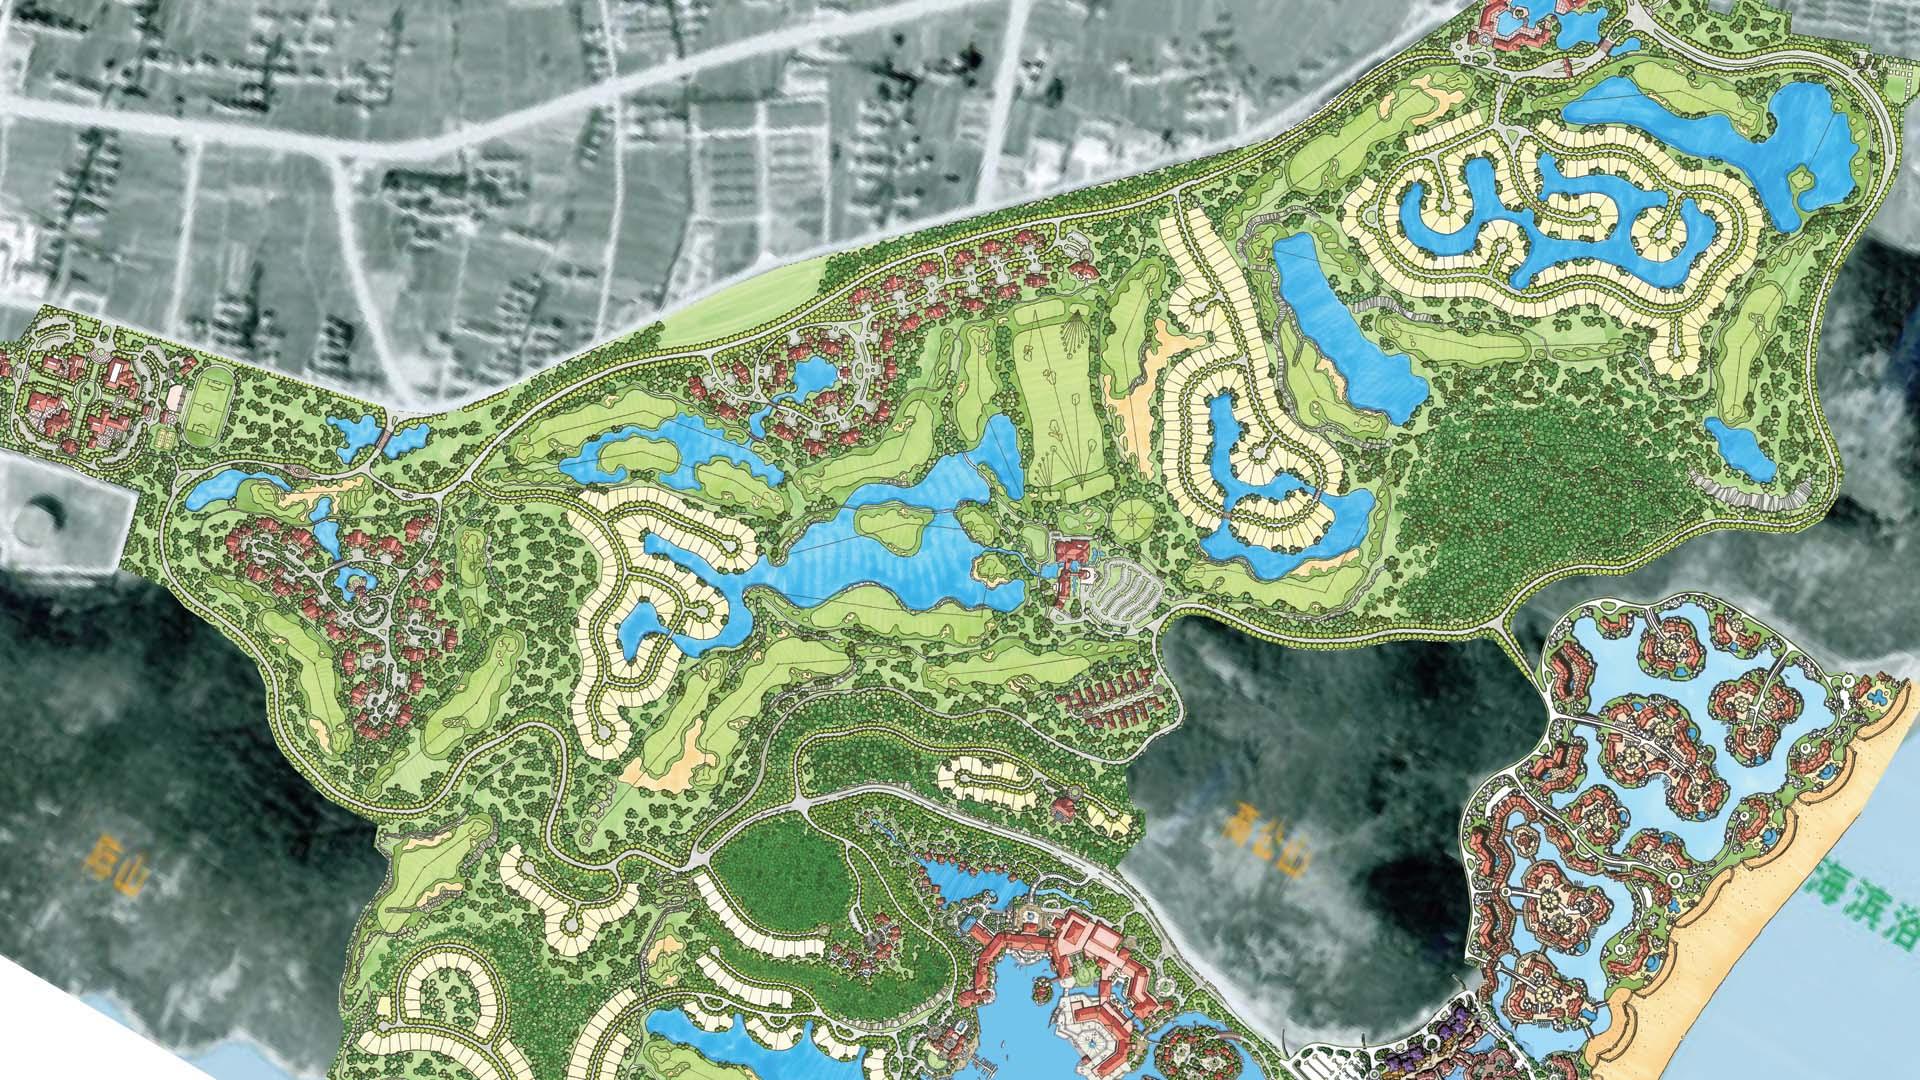 nine-dragons-resort-and-golf-club-master-plan-730.jpg